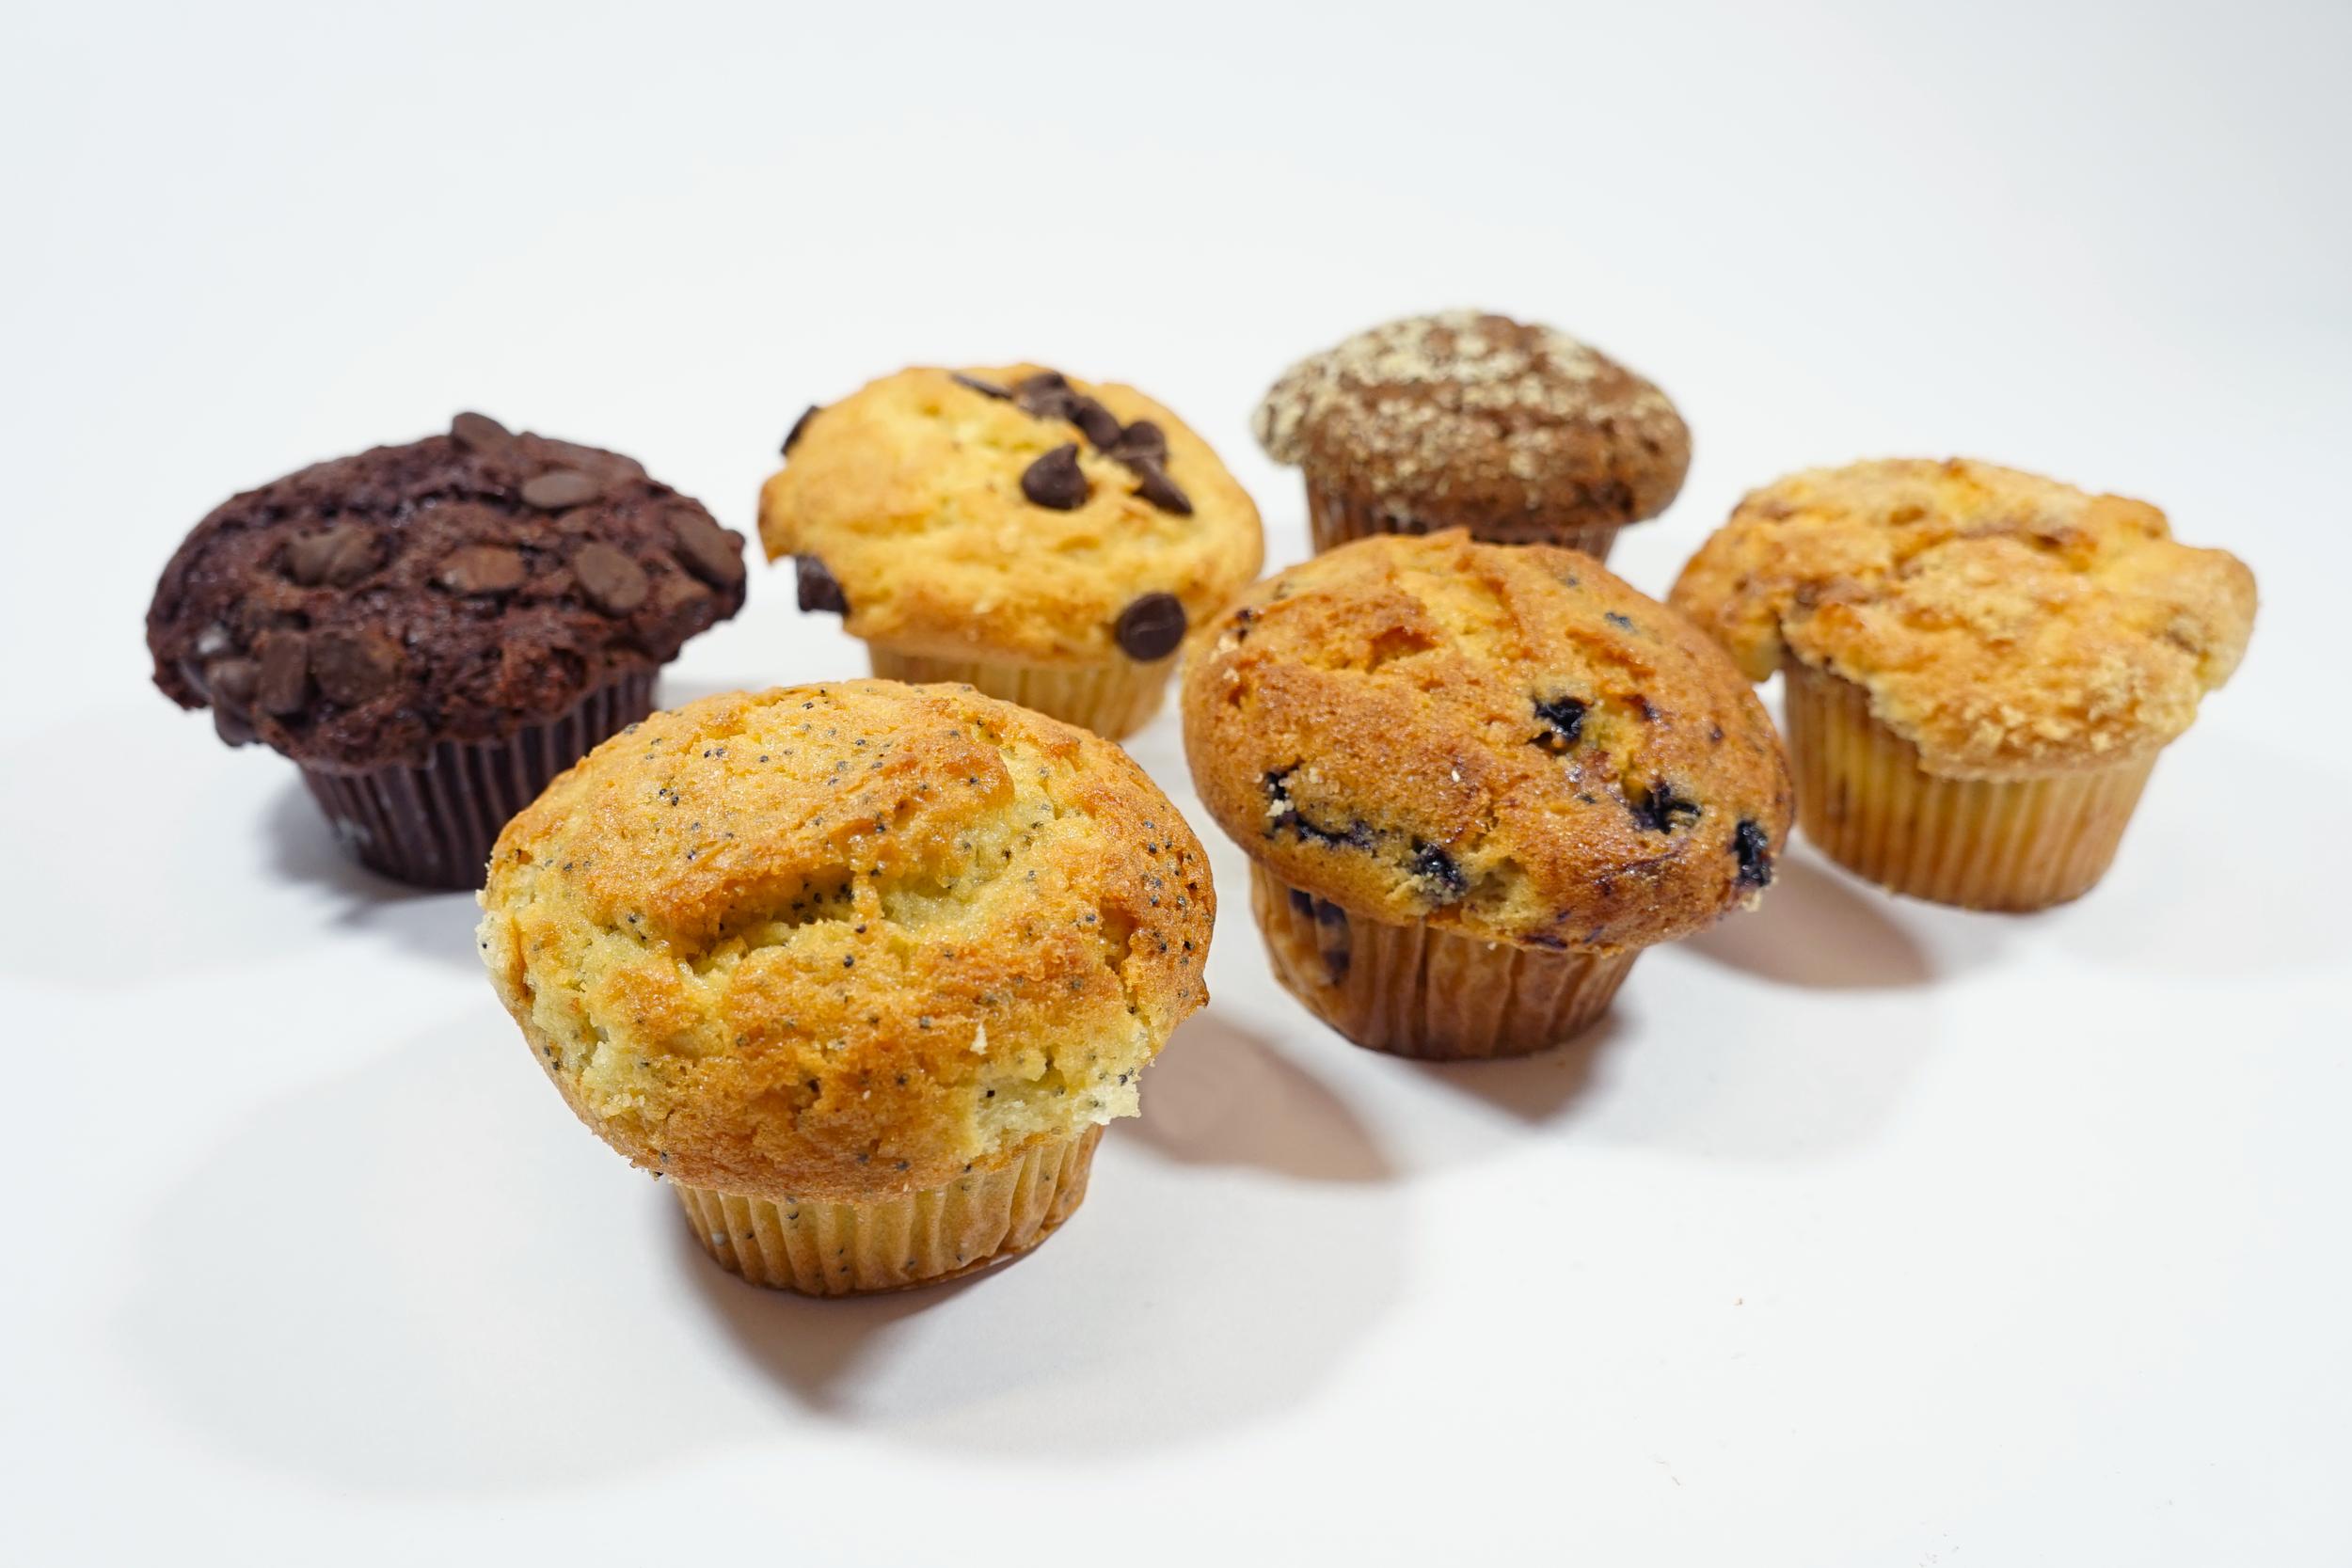 Muffin - Molasses Bran, Lemon Poppy-seed, Blueberry, Chocolate Chip, Double Chocolate Chip, Cinnamon Chip, Cherry Almond